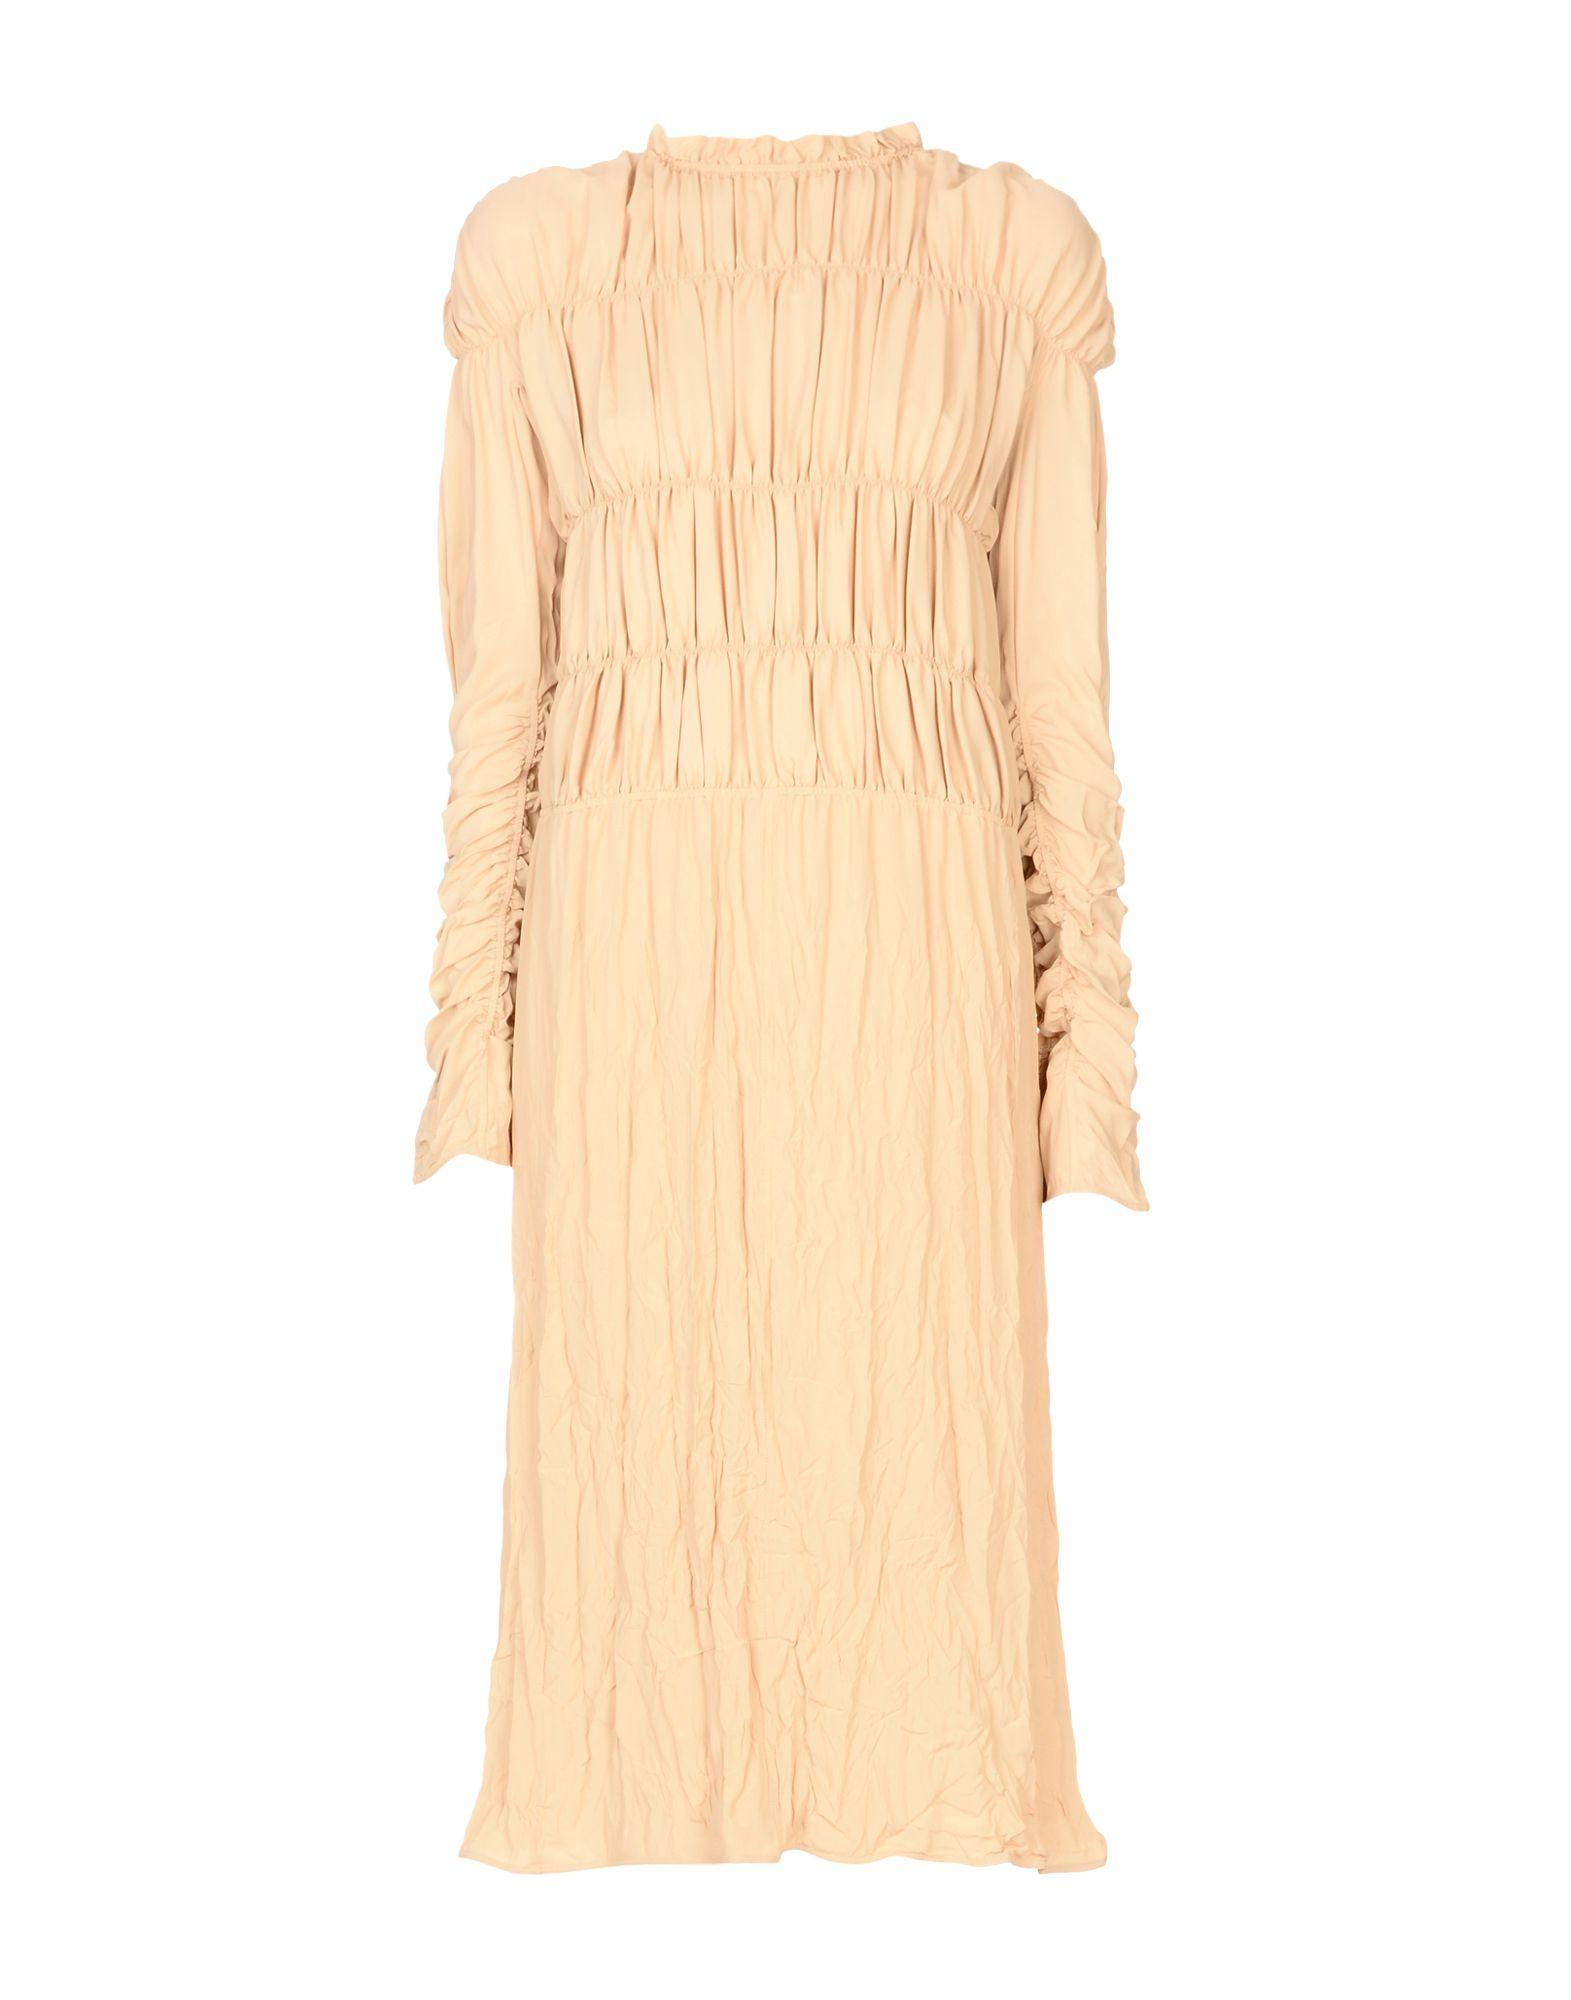 Marni Midi Dress In Sand